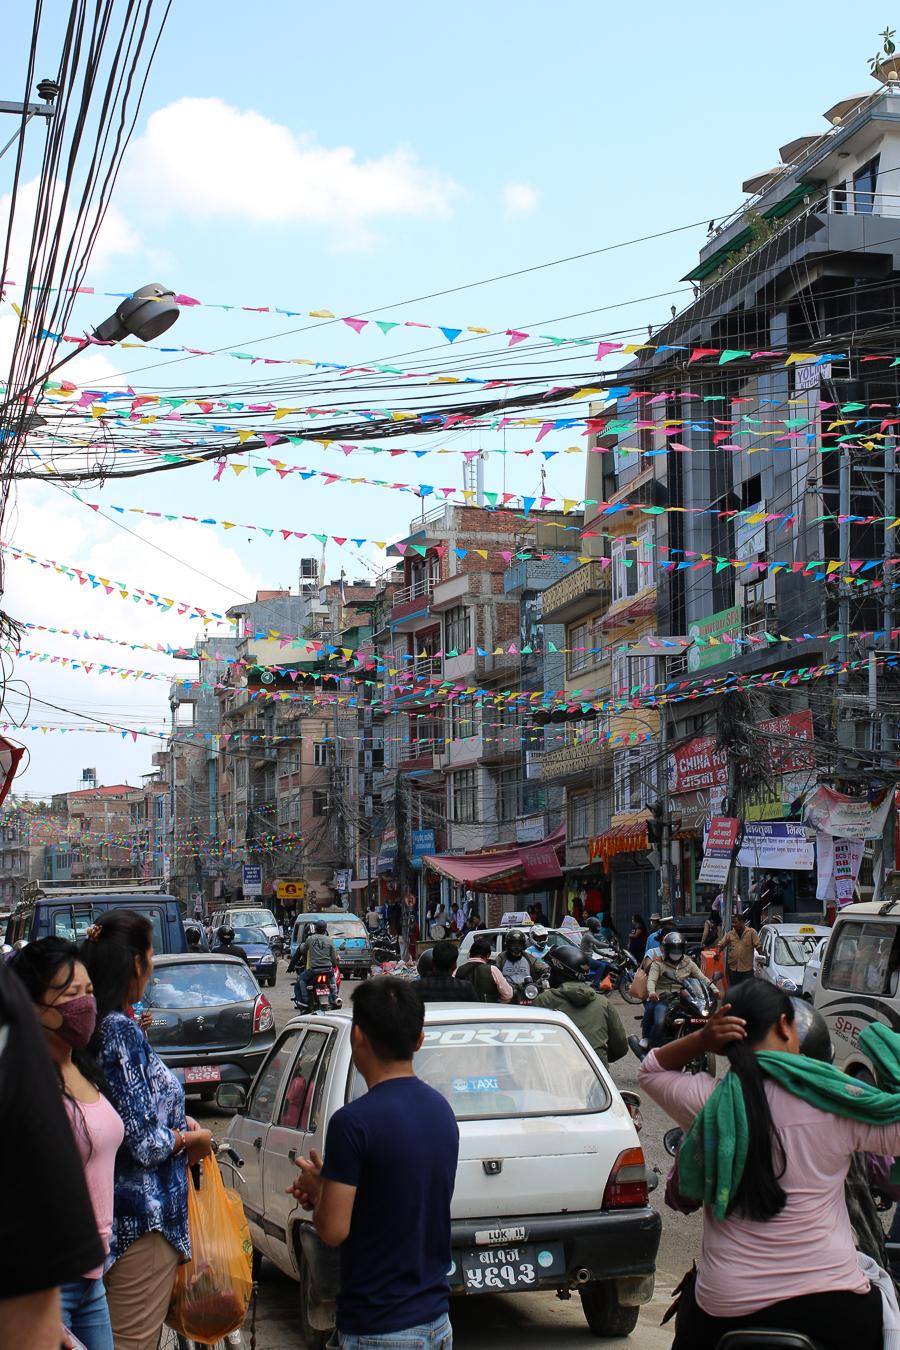 Nepal. On the Streets of Kathmandu